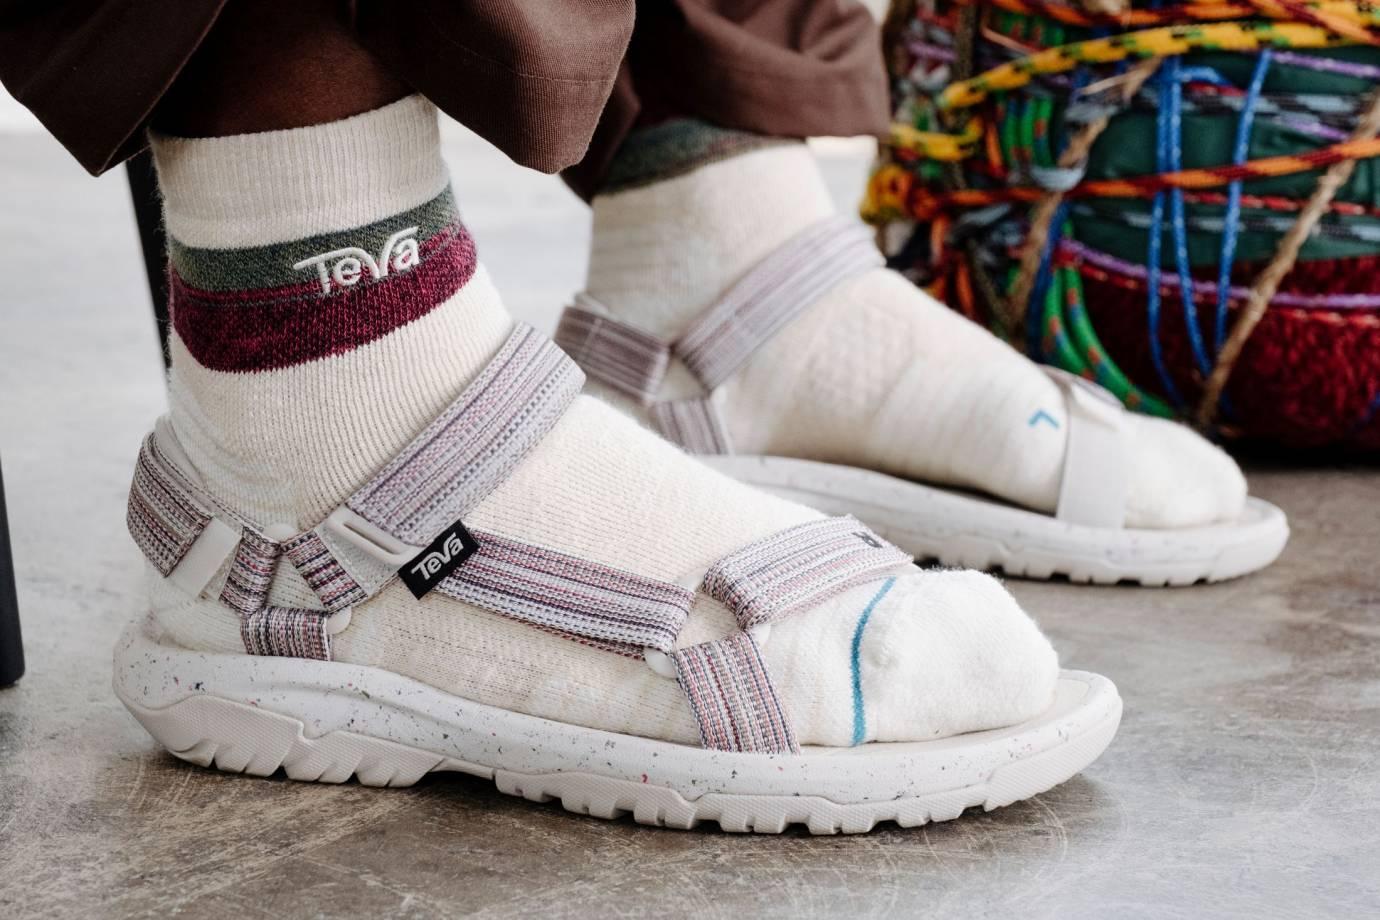 teva x stance socks with sandals